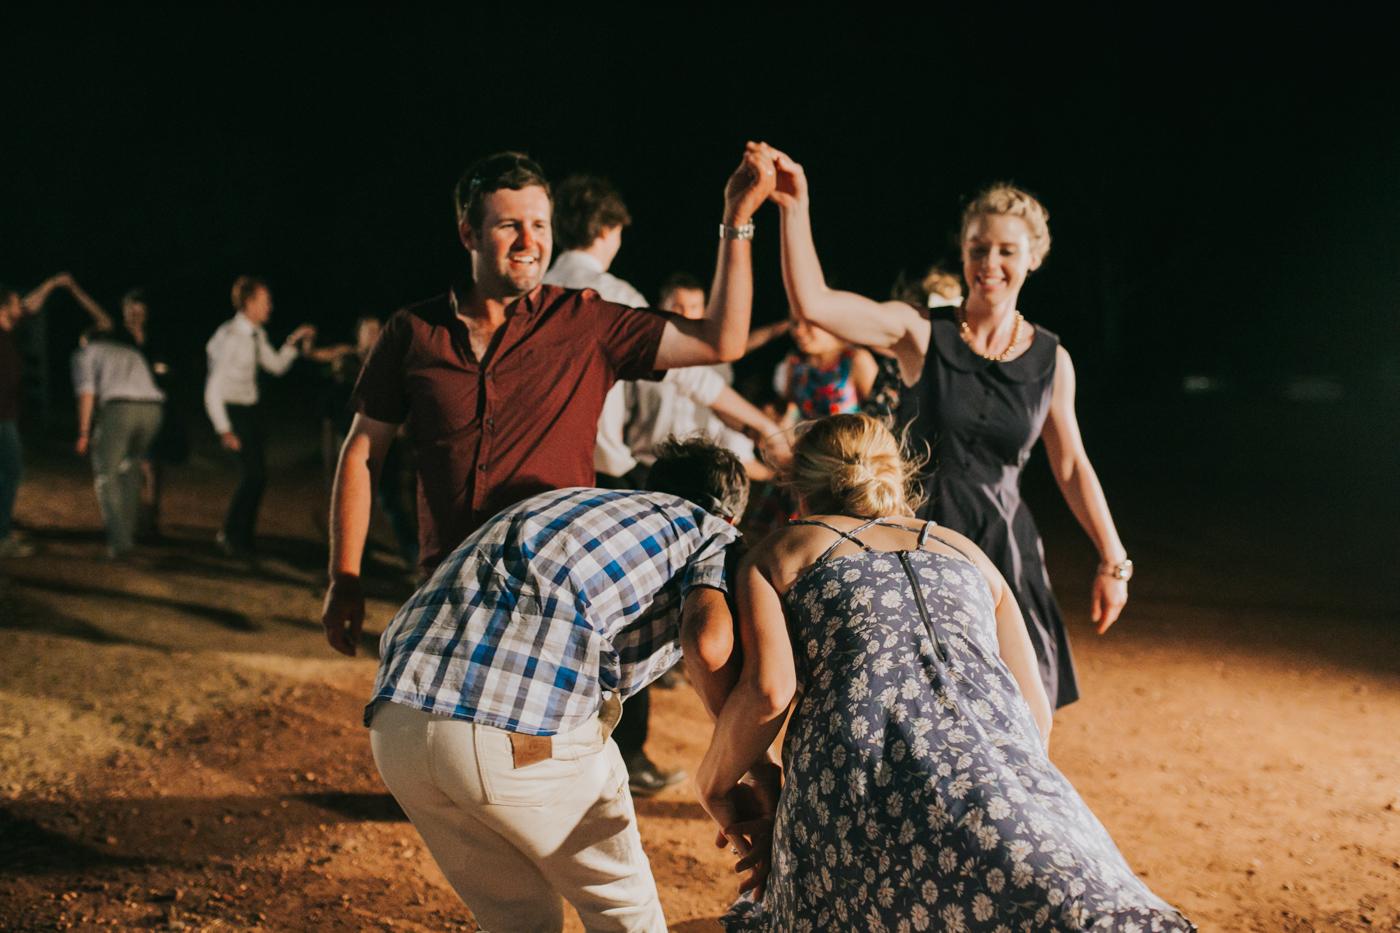 Nicolle & Jacob - Dubbo Wedding - Country Australia - Samantha Heather Photography-307.jpg